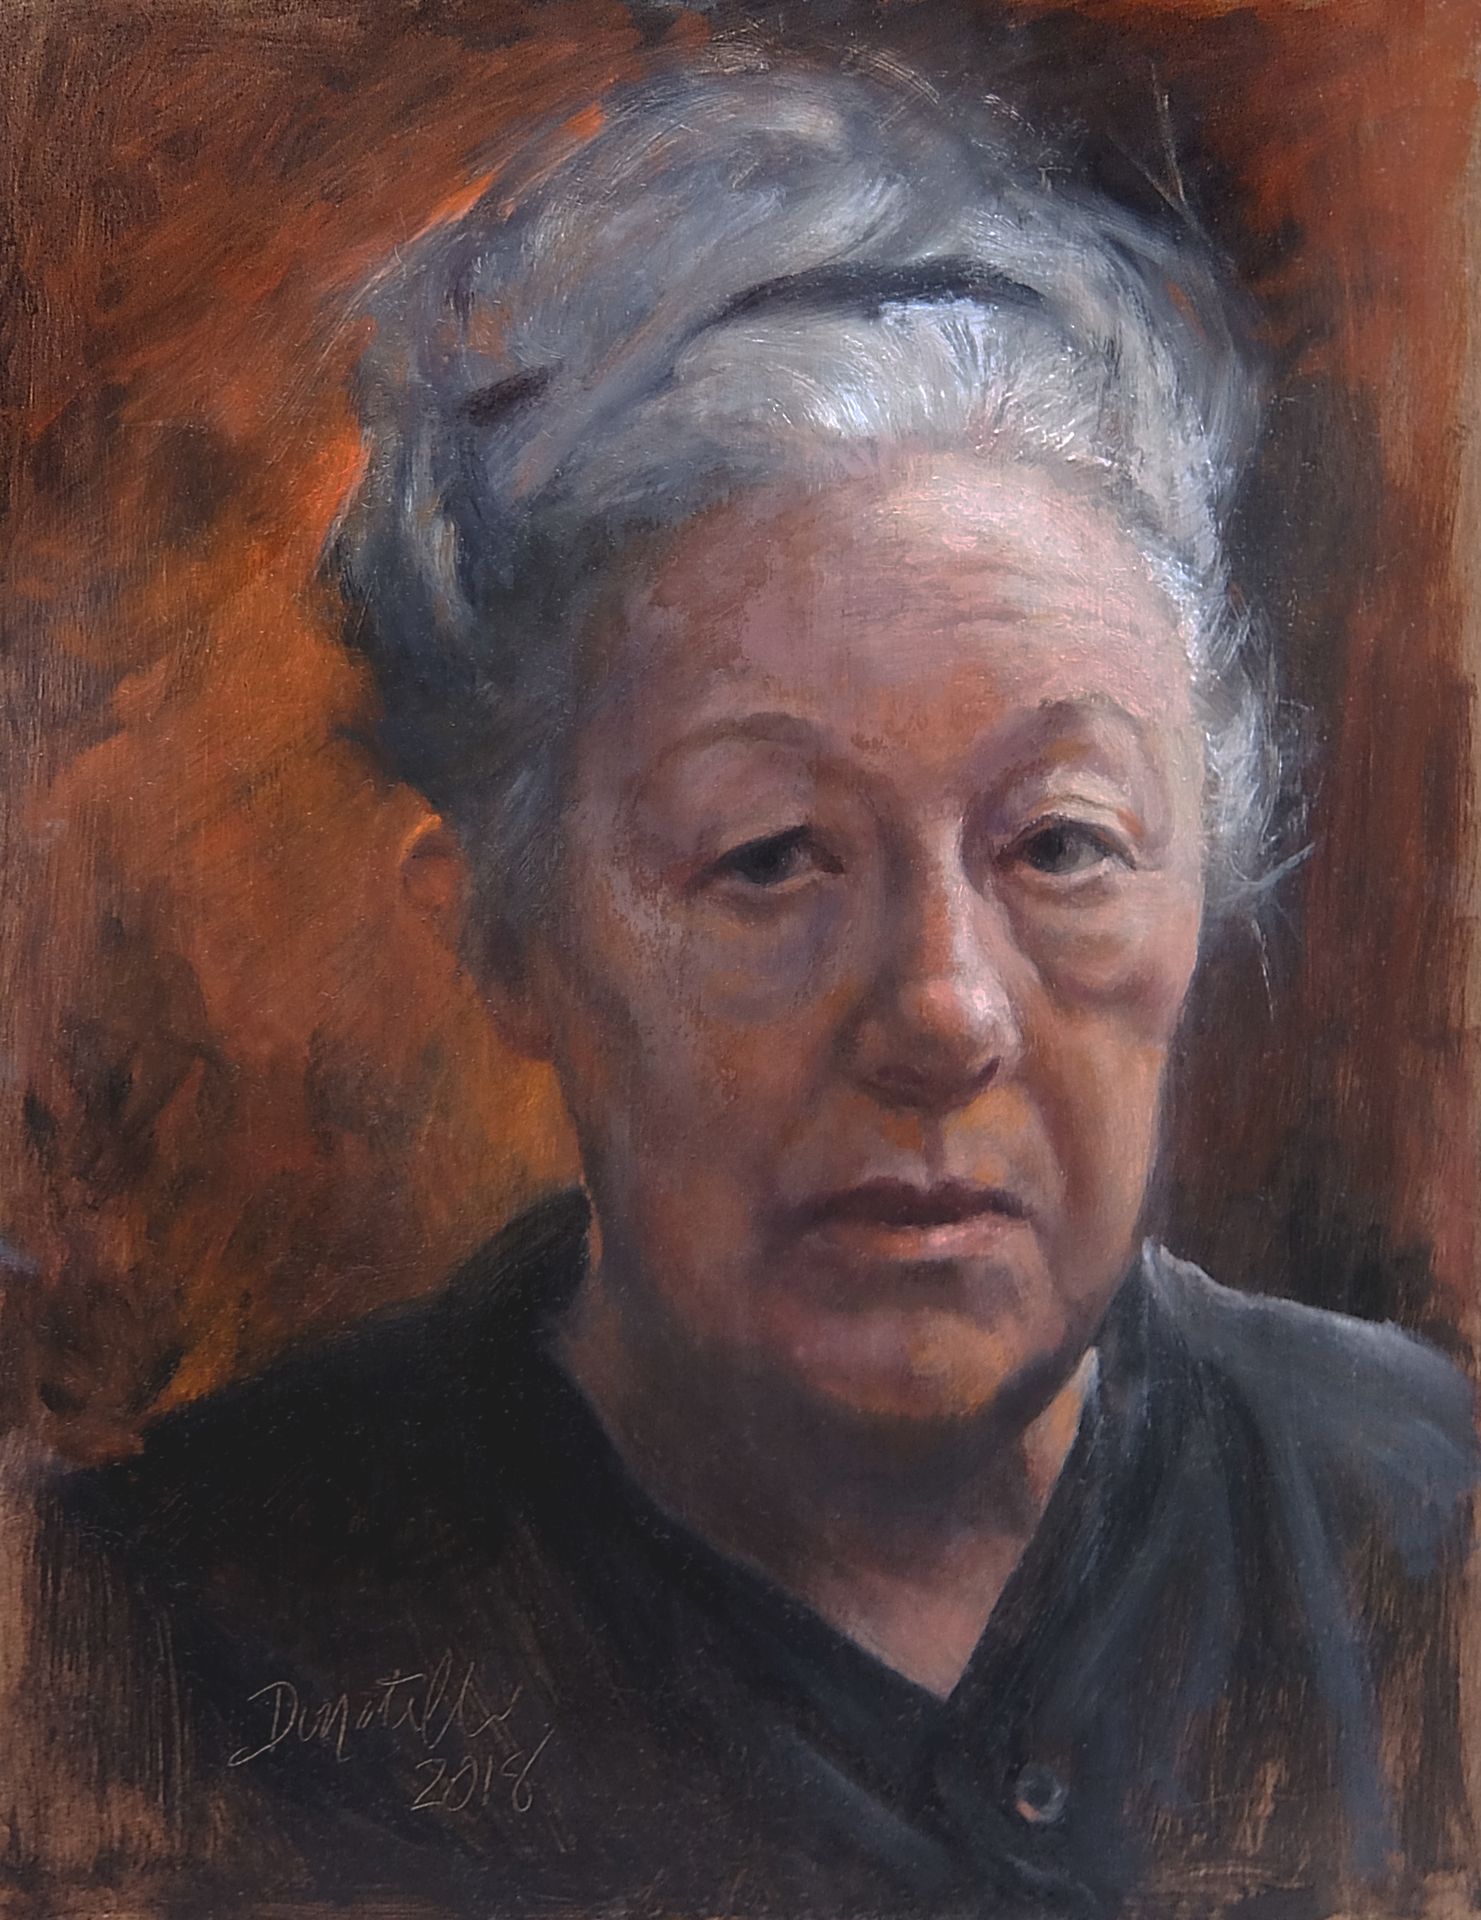 Katheryn Donatelli